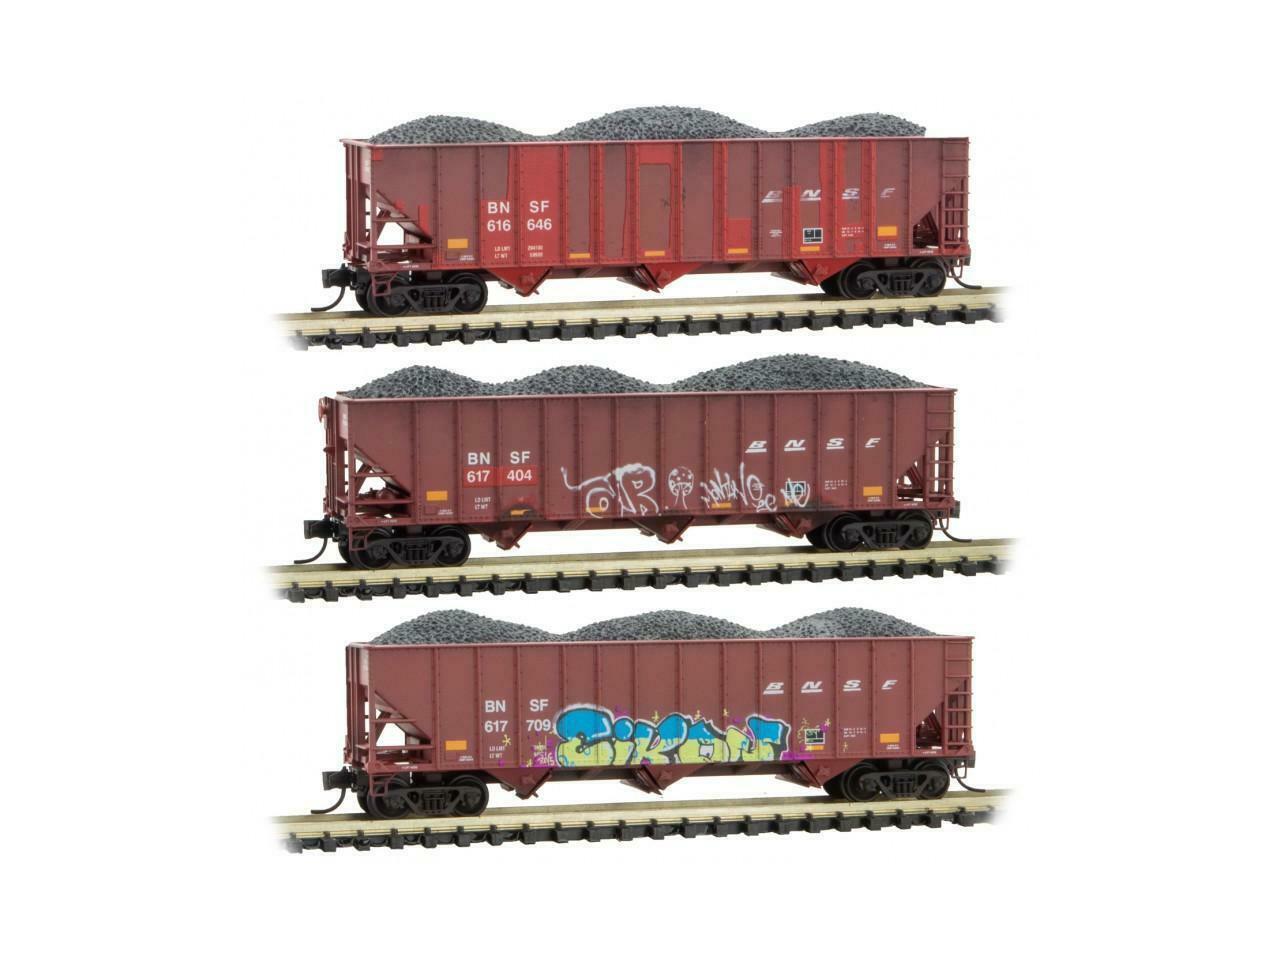 Micro Trains 993 05 710 N Scale BNSF Weathered 3 Pack